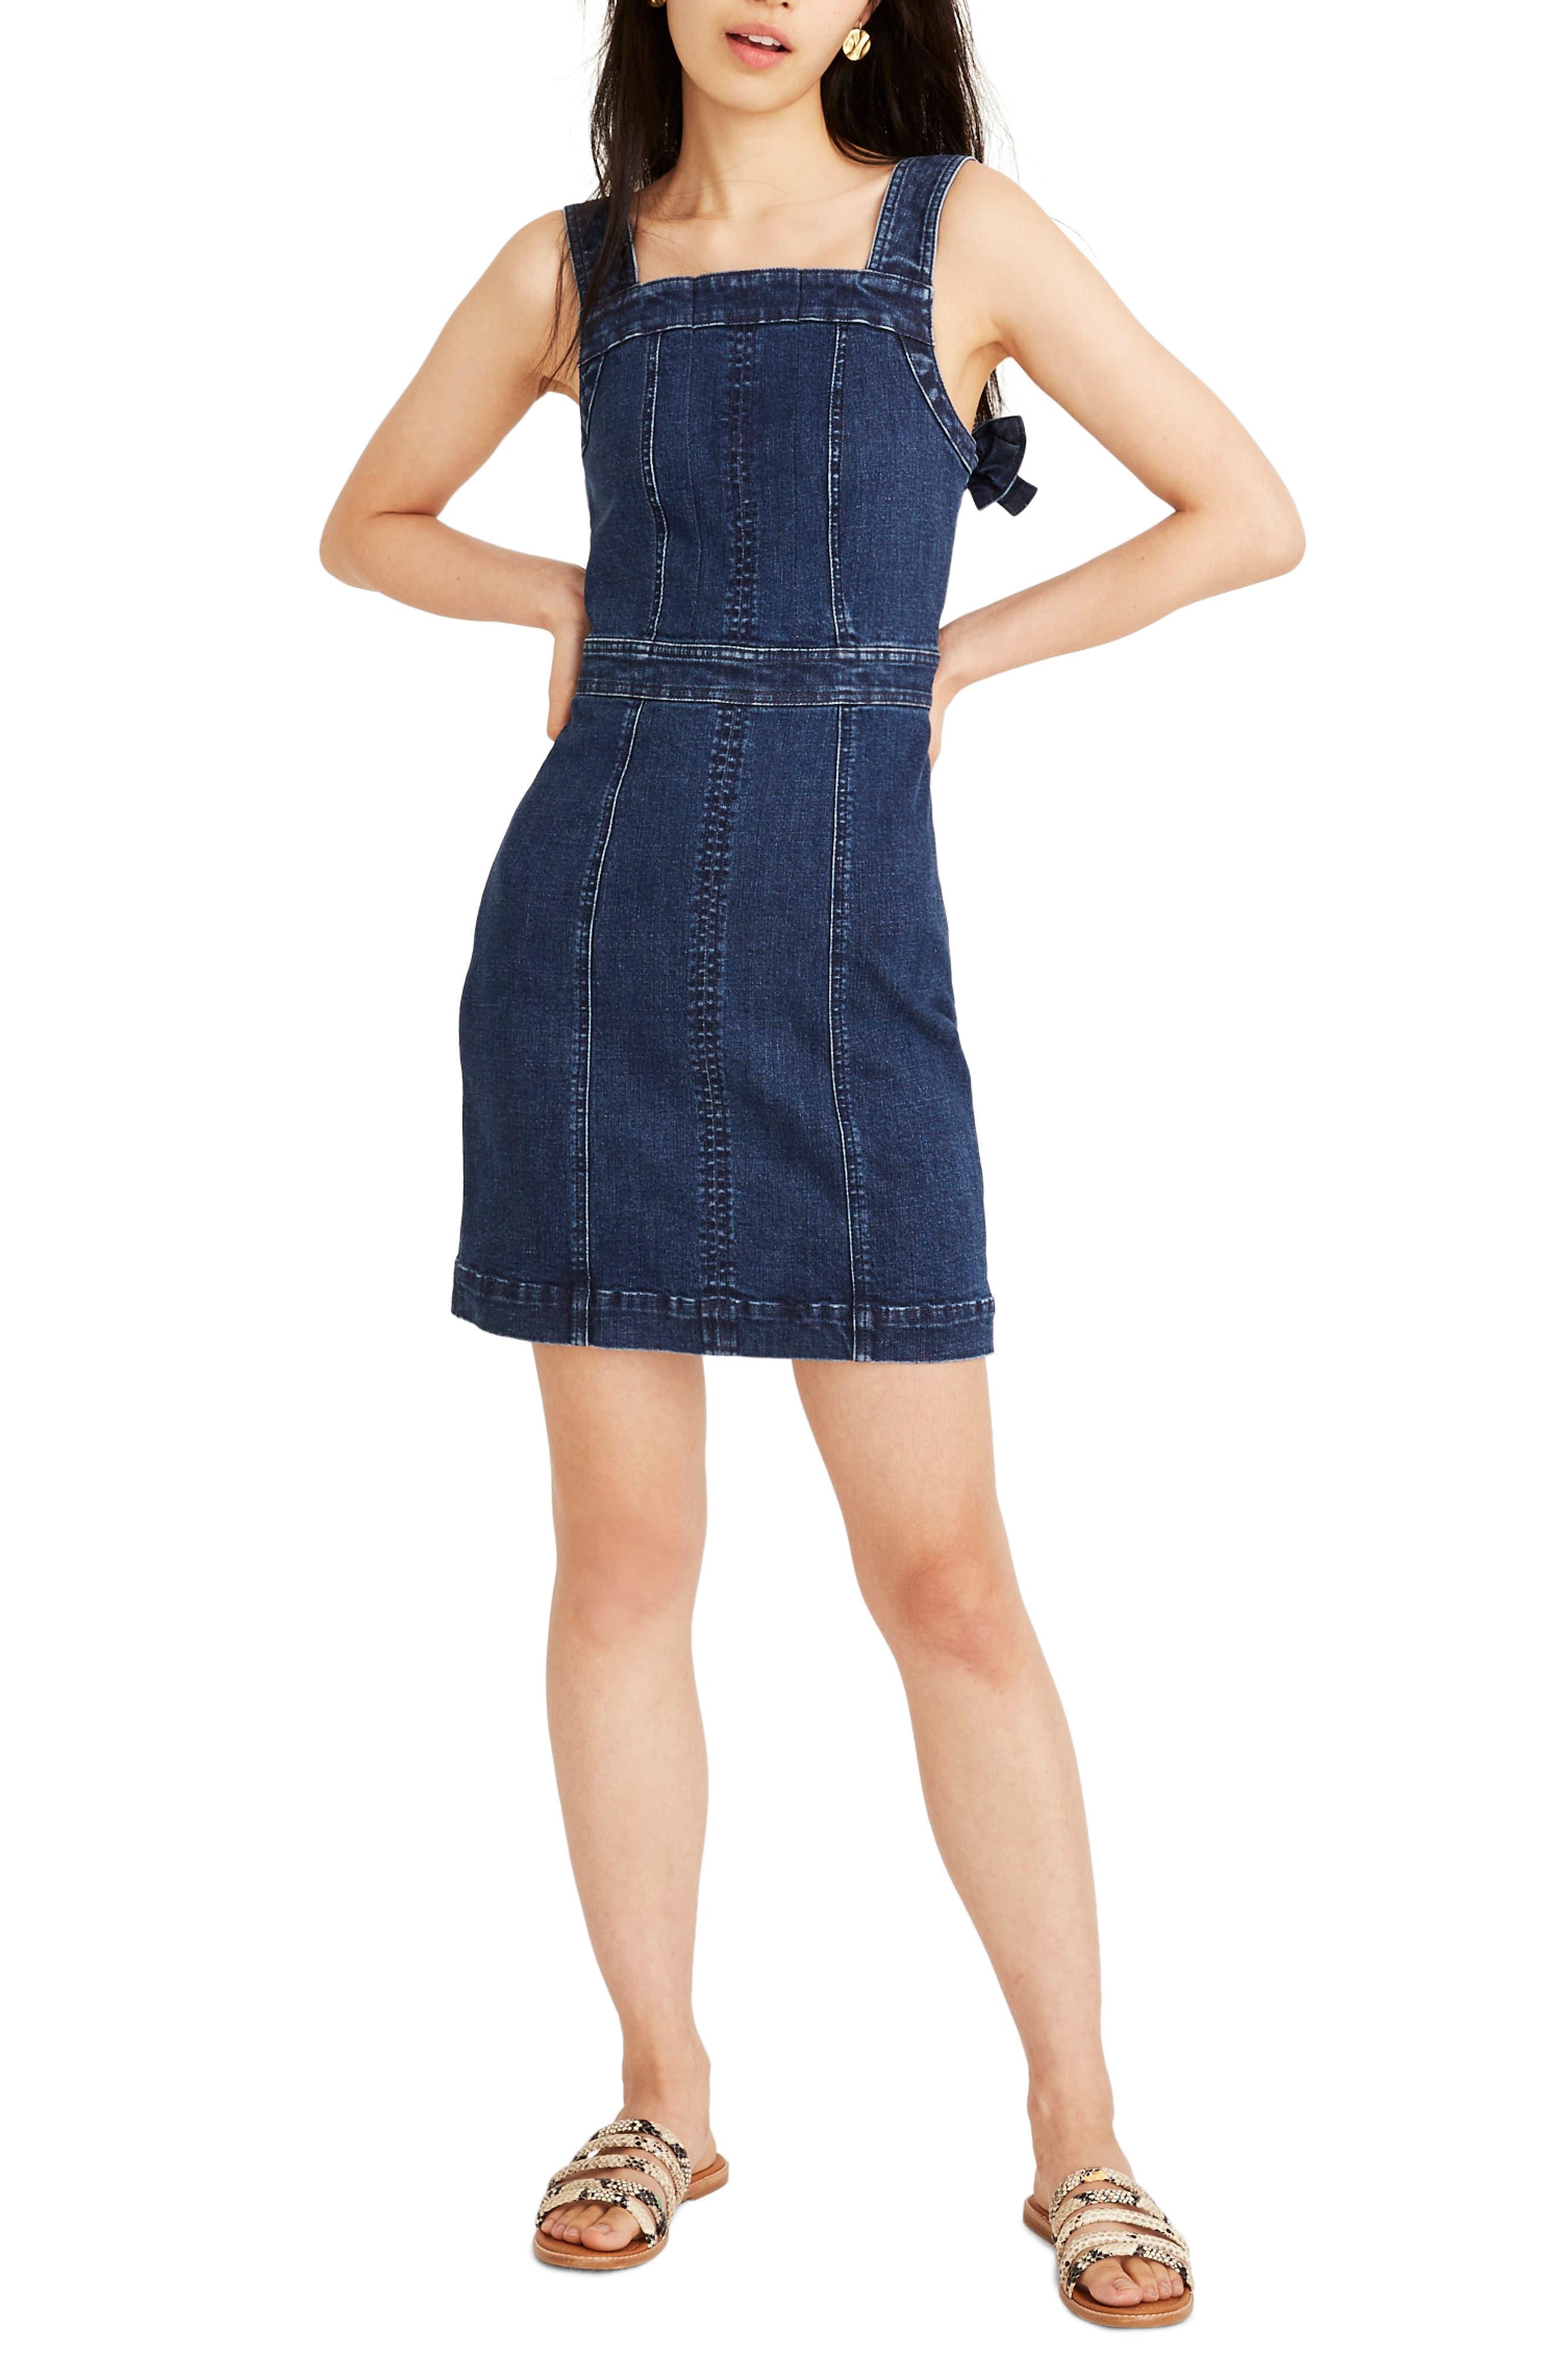 Madewell Denim Apron Bow Back Dress, Blue